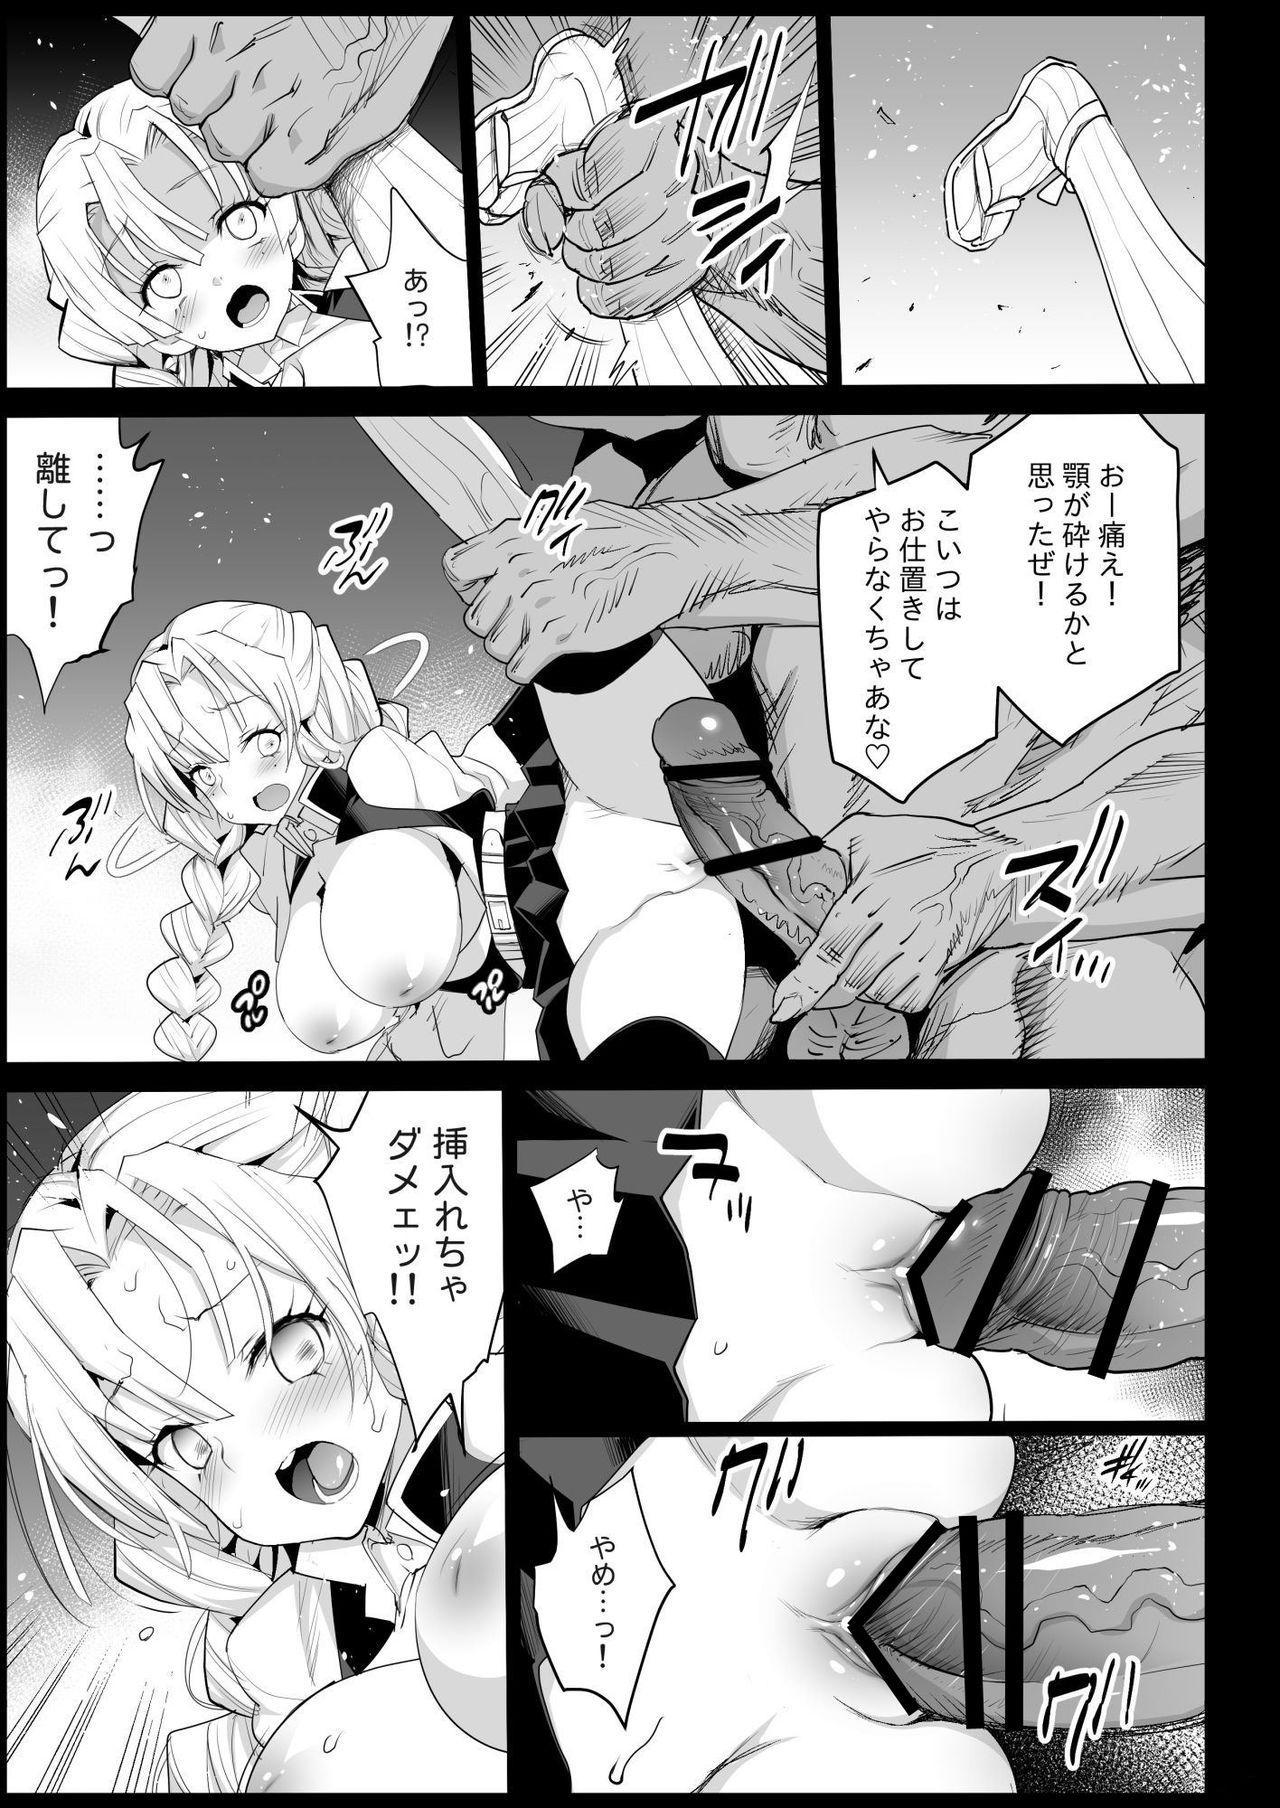 Kimetsu no Urabon - RAPE OF DEMON SLAYER 8